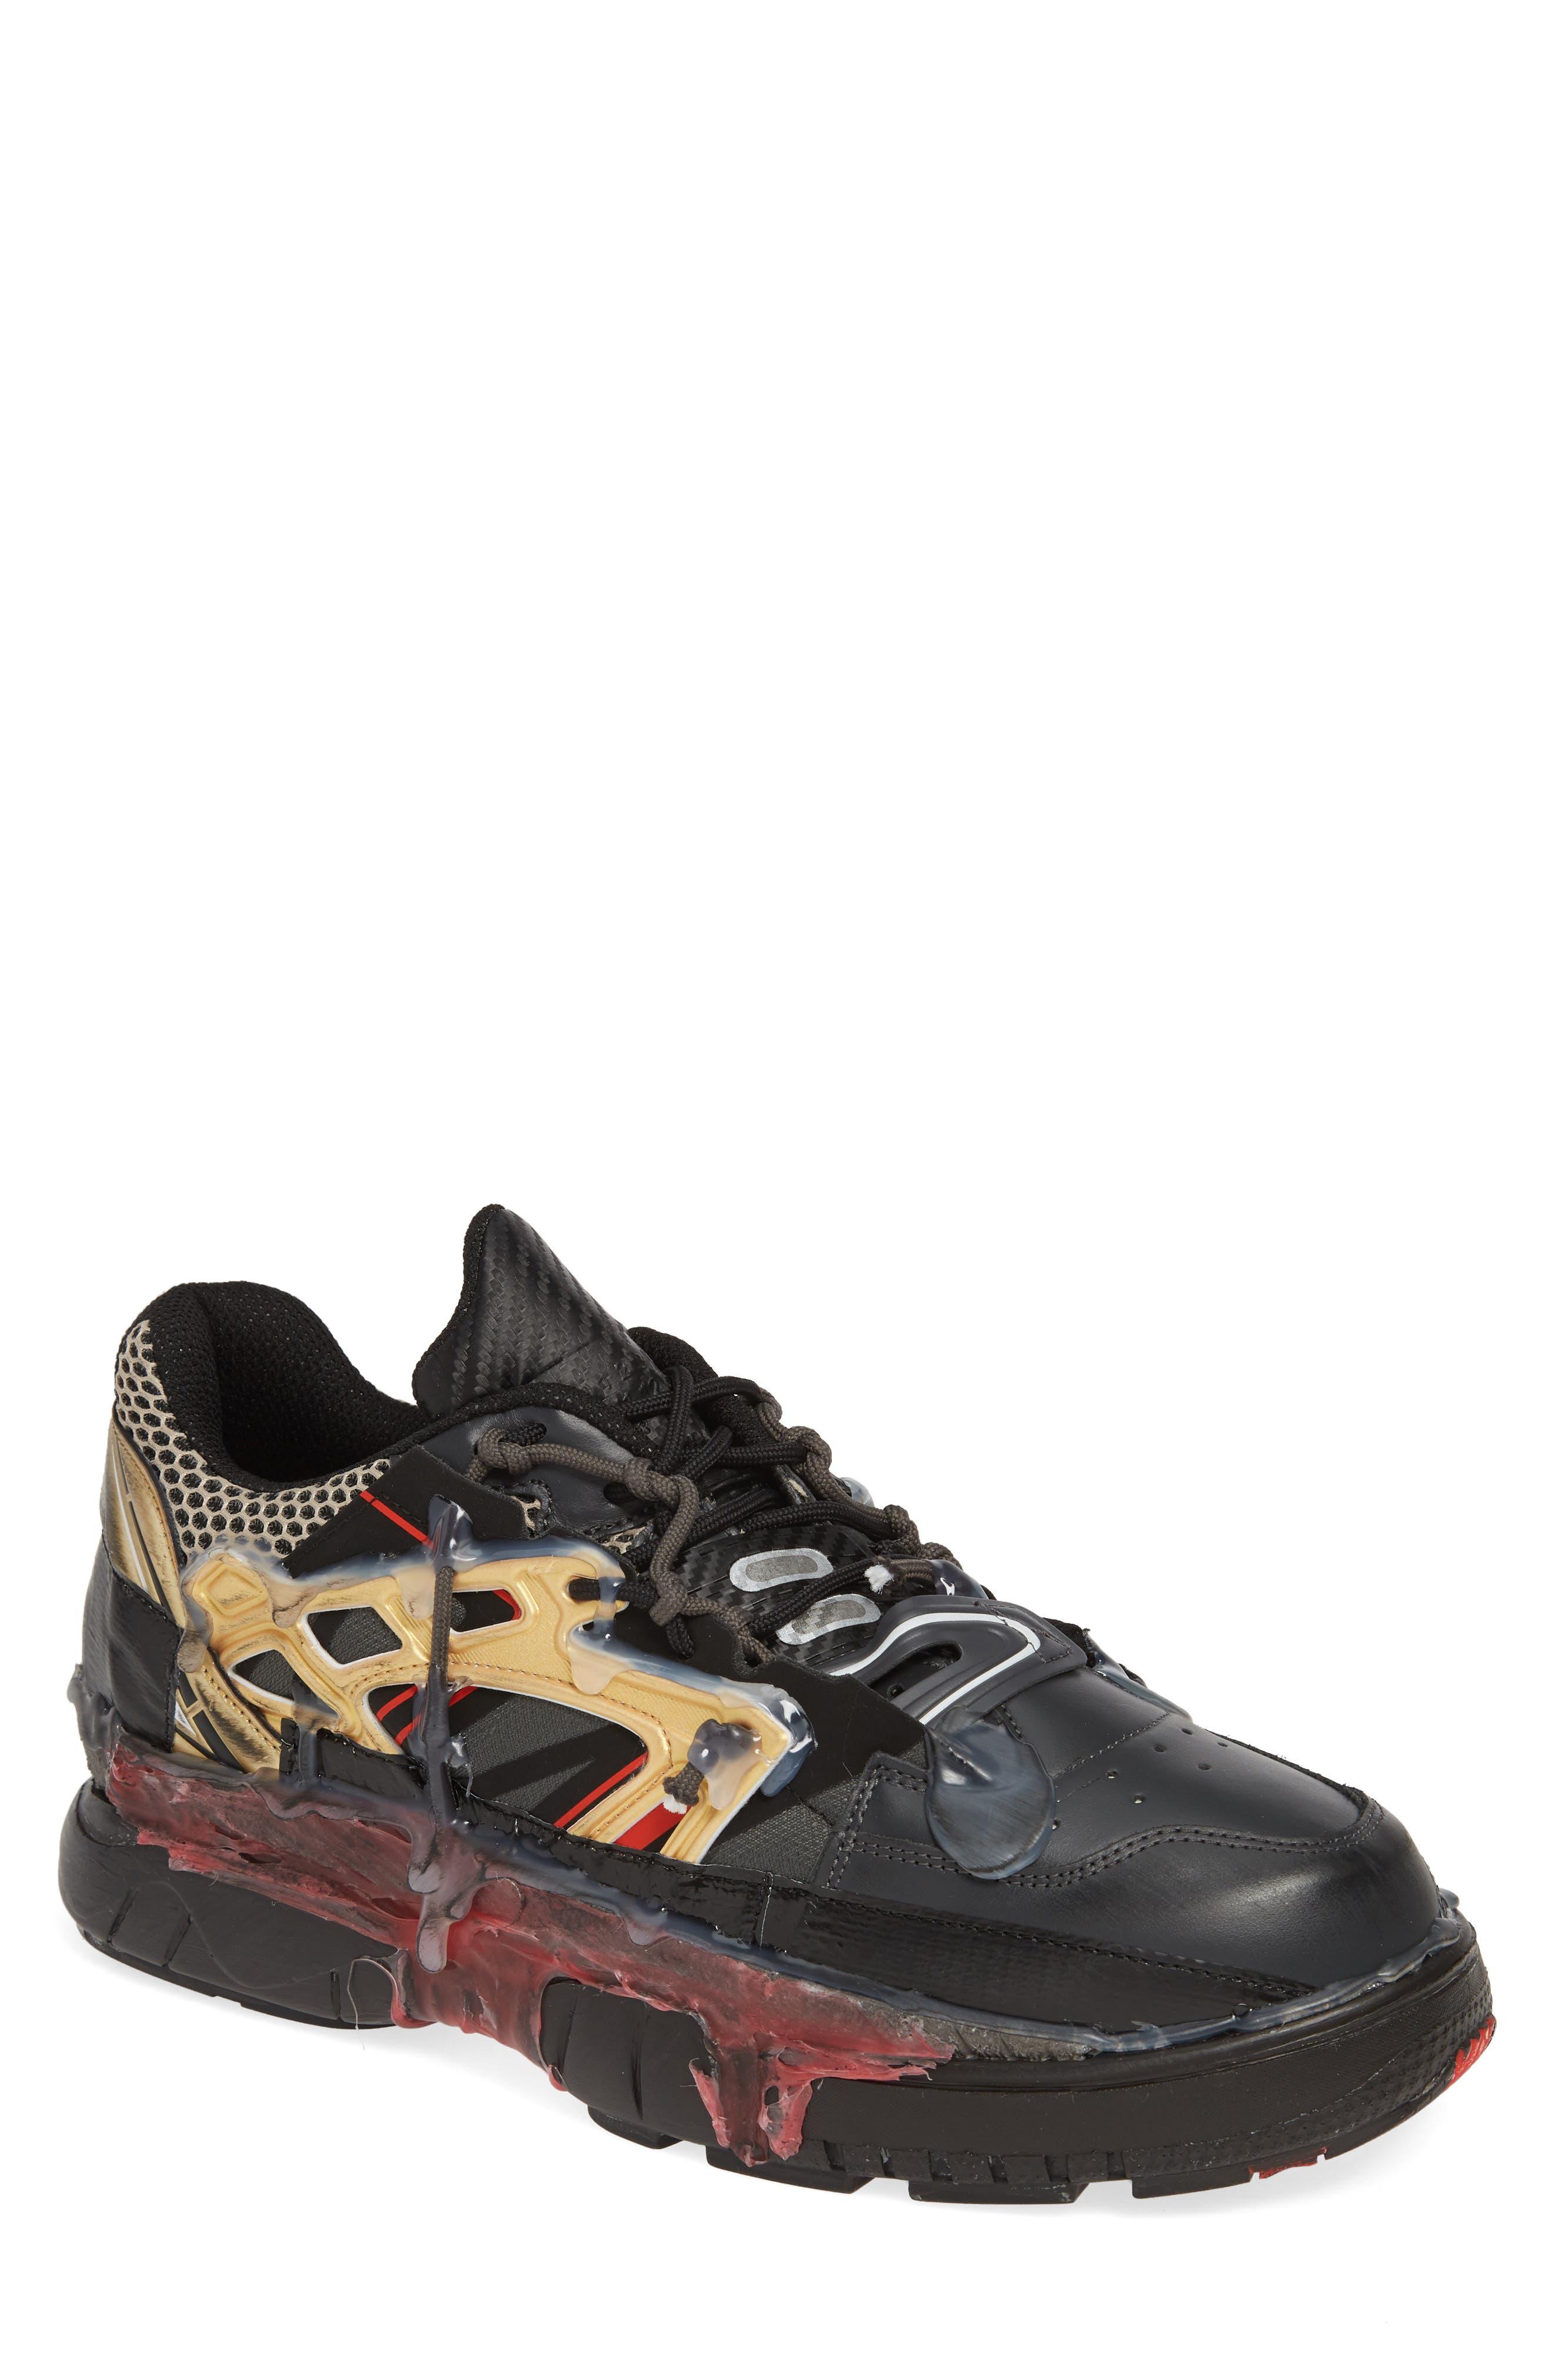 MM6 MAISON MARGIELA Maison Margiela Fusion Sneaker, Main, color, BLACK/ GOLD/ RED